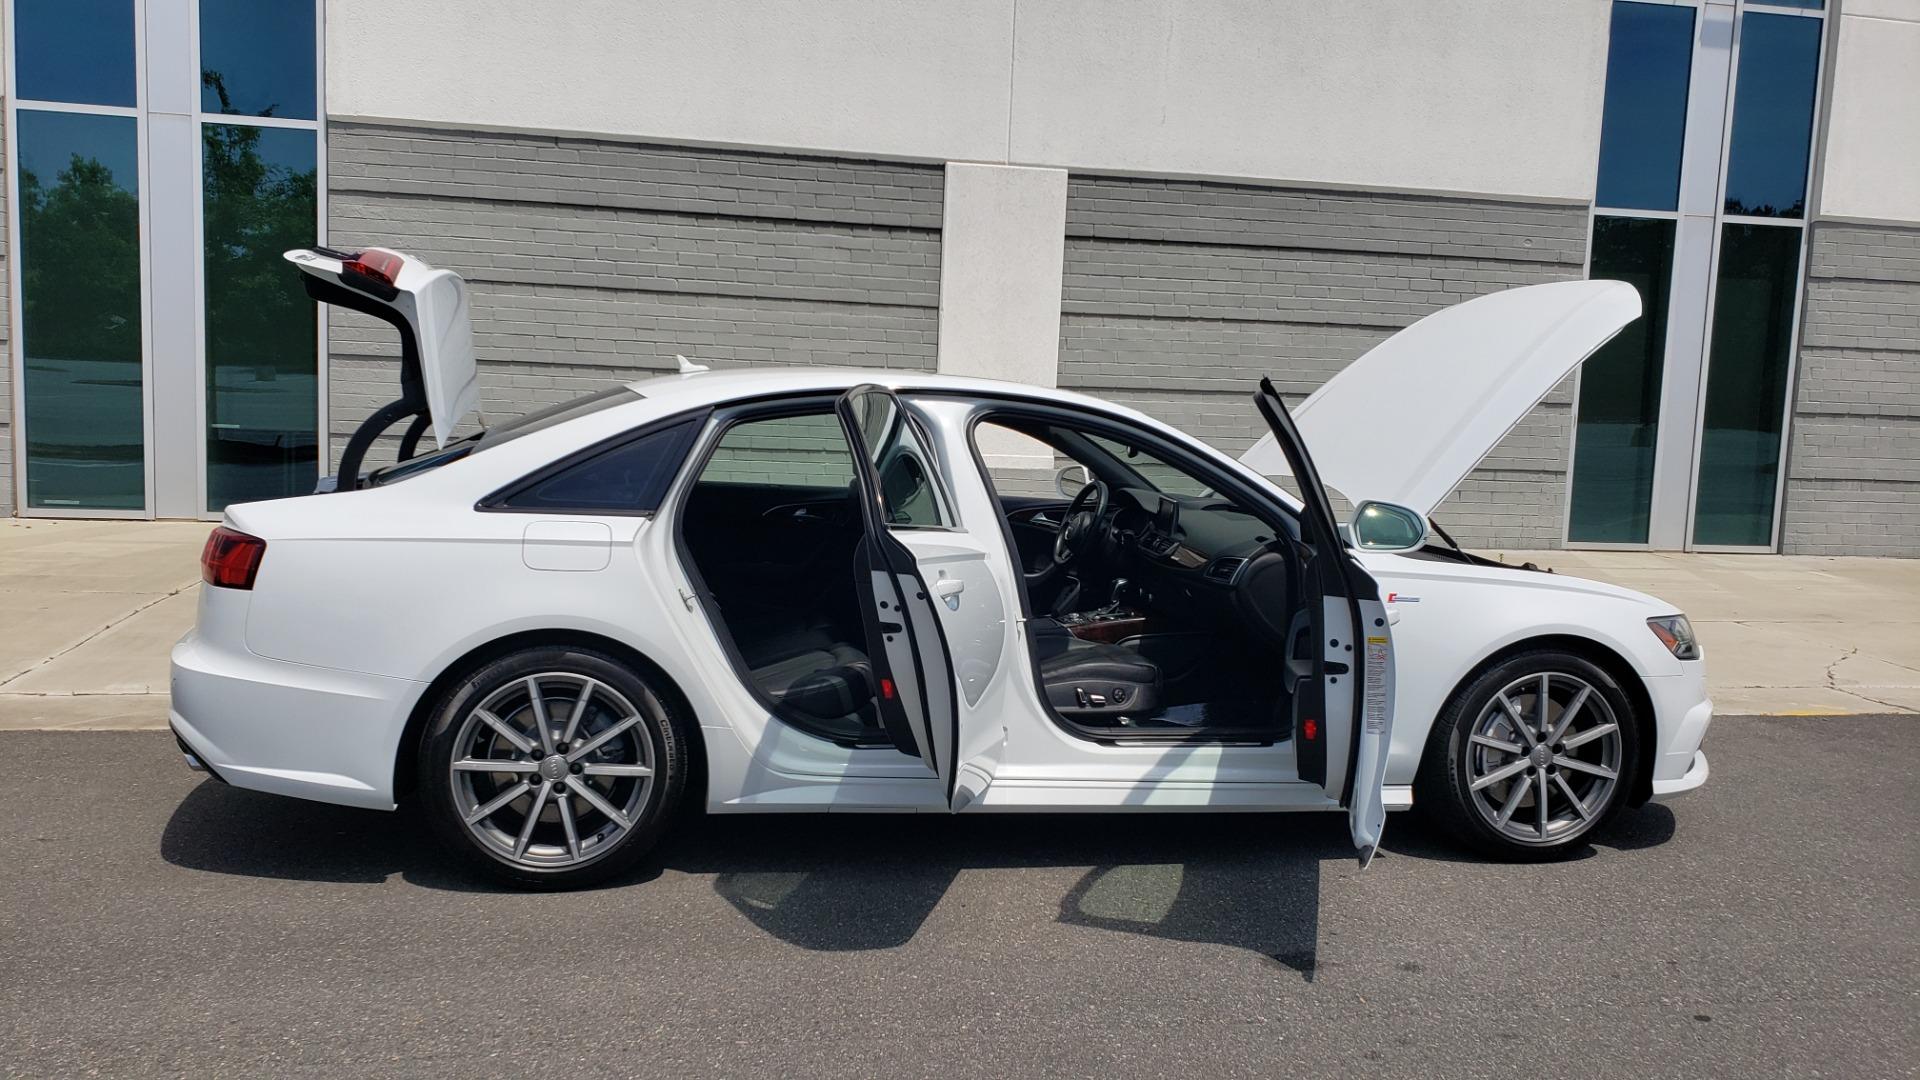 Used 2017 Audi A6 PRESTIGE SEDAN 3.0T / NAV / SUNROOF / BLACK OPTIC / CLD WTHR / REARVIEW for sale $30,797 at Formula Imports in Charlotte NC 28227 14